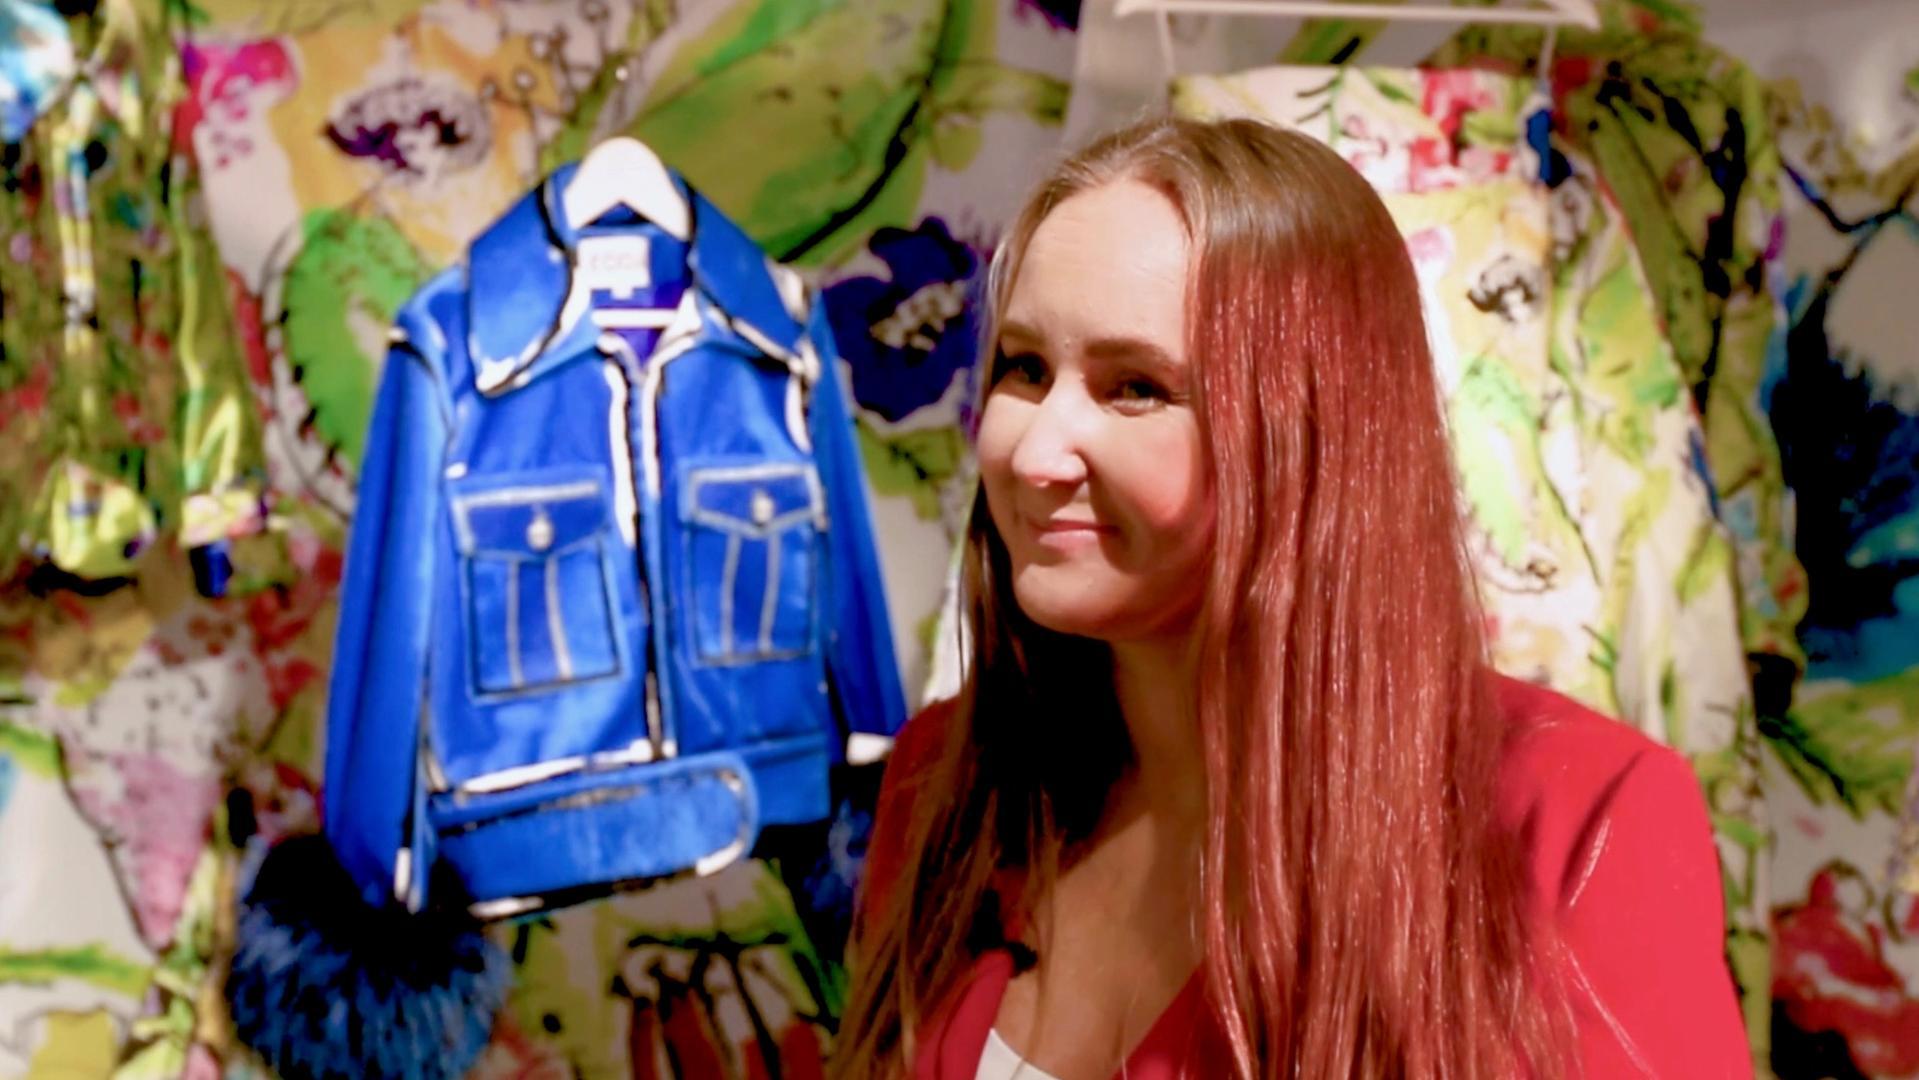 Oslo Fashion Art Festival